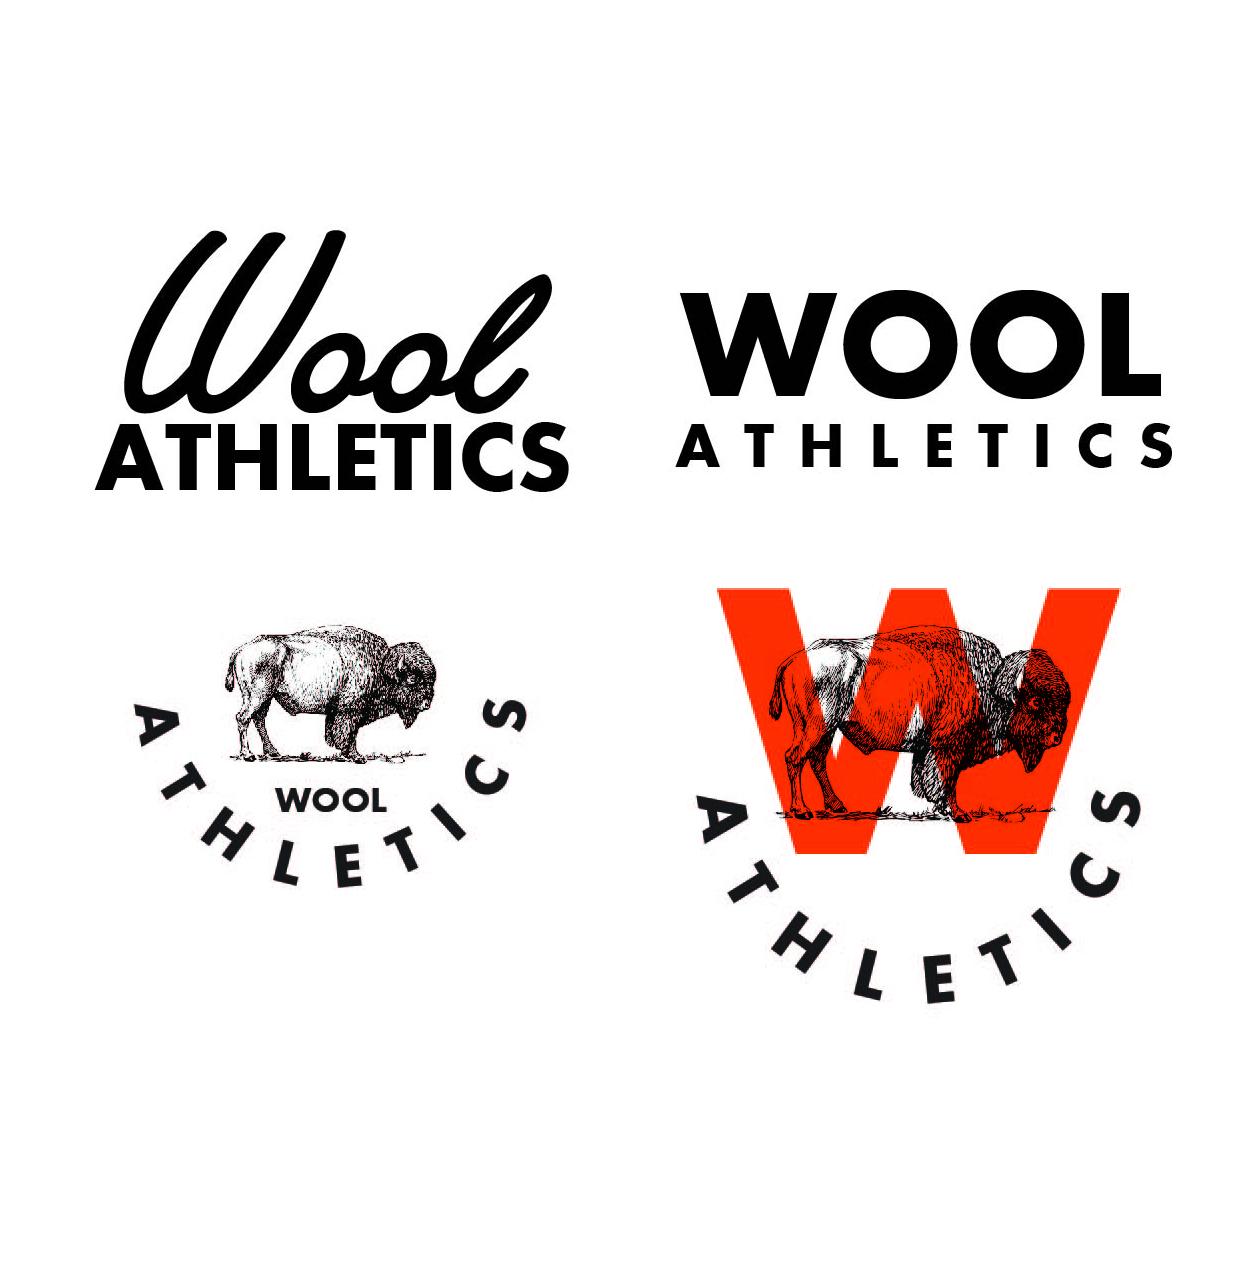 wool athletics.jpg